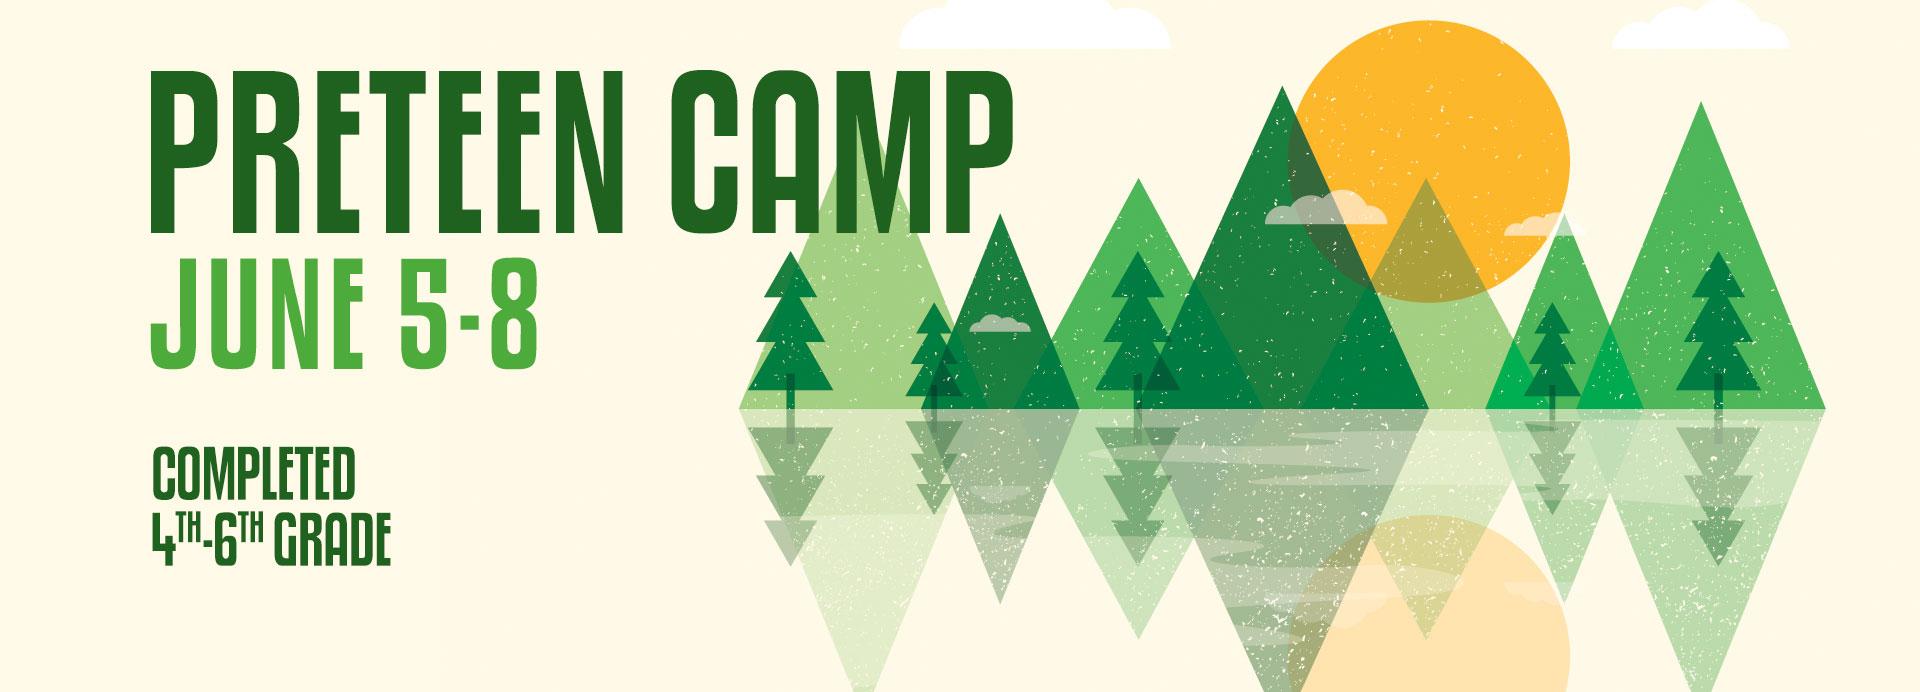 PreteenCamp-banner.jpg